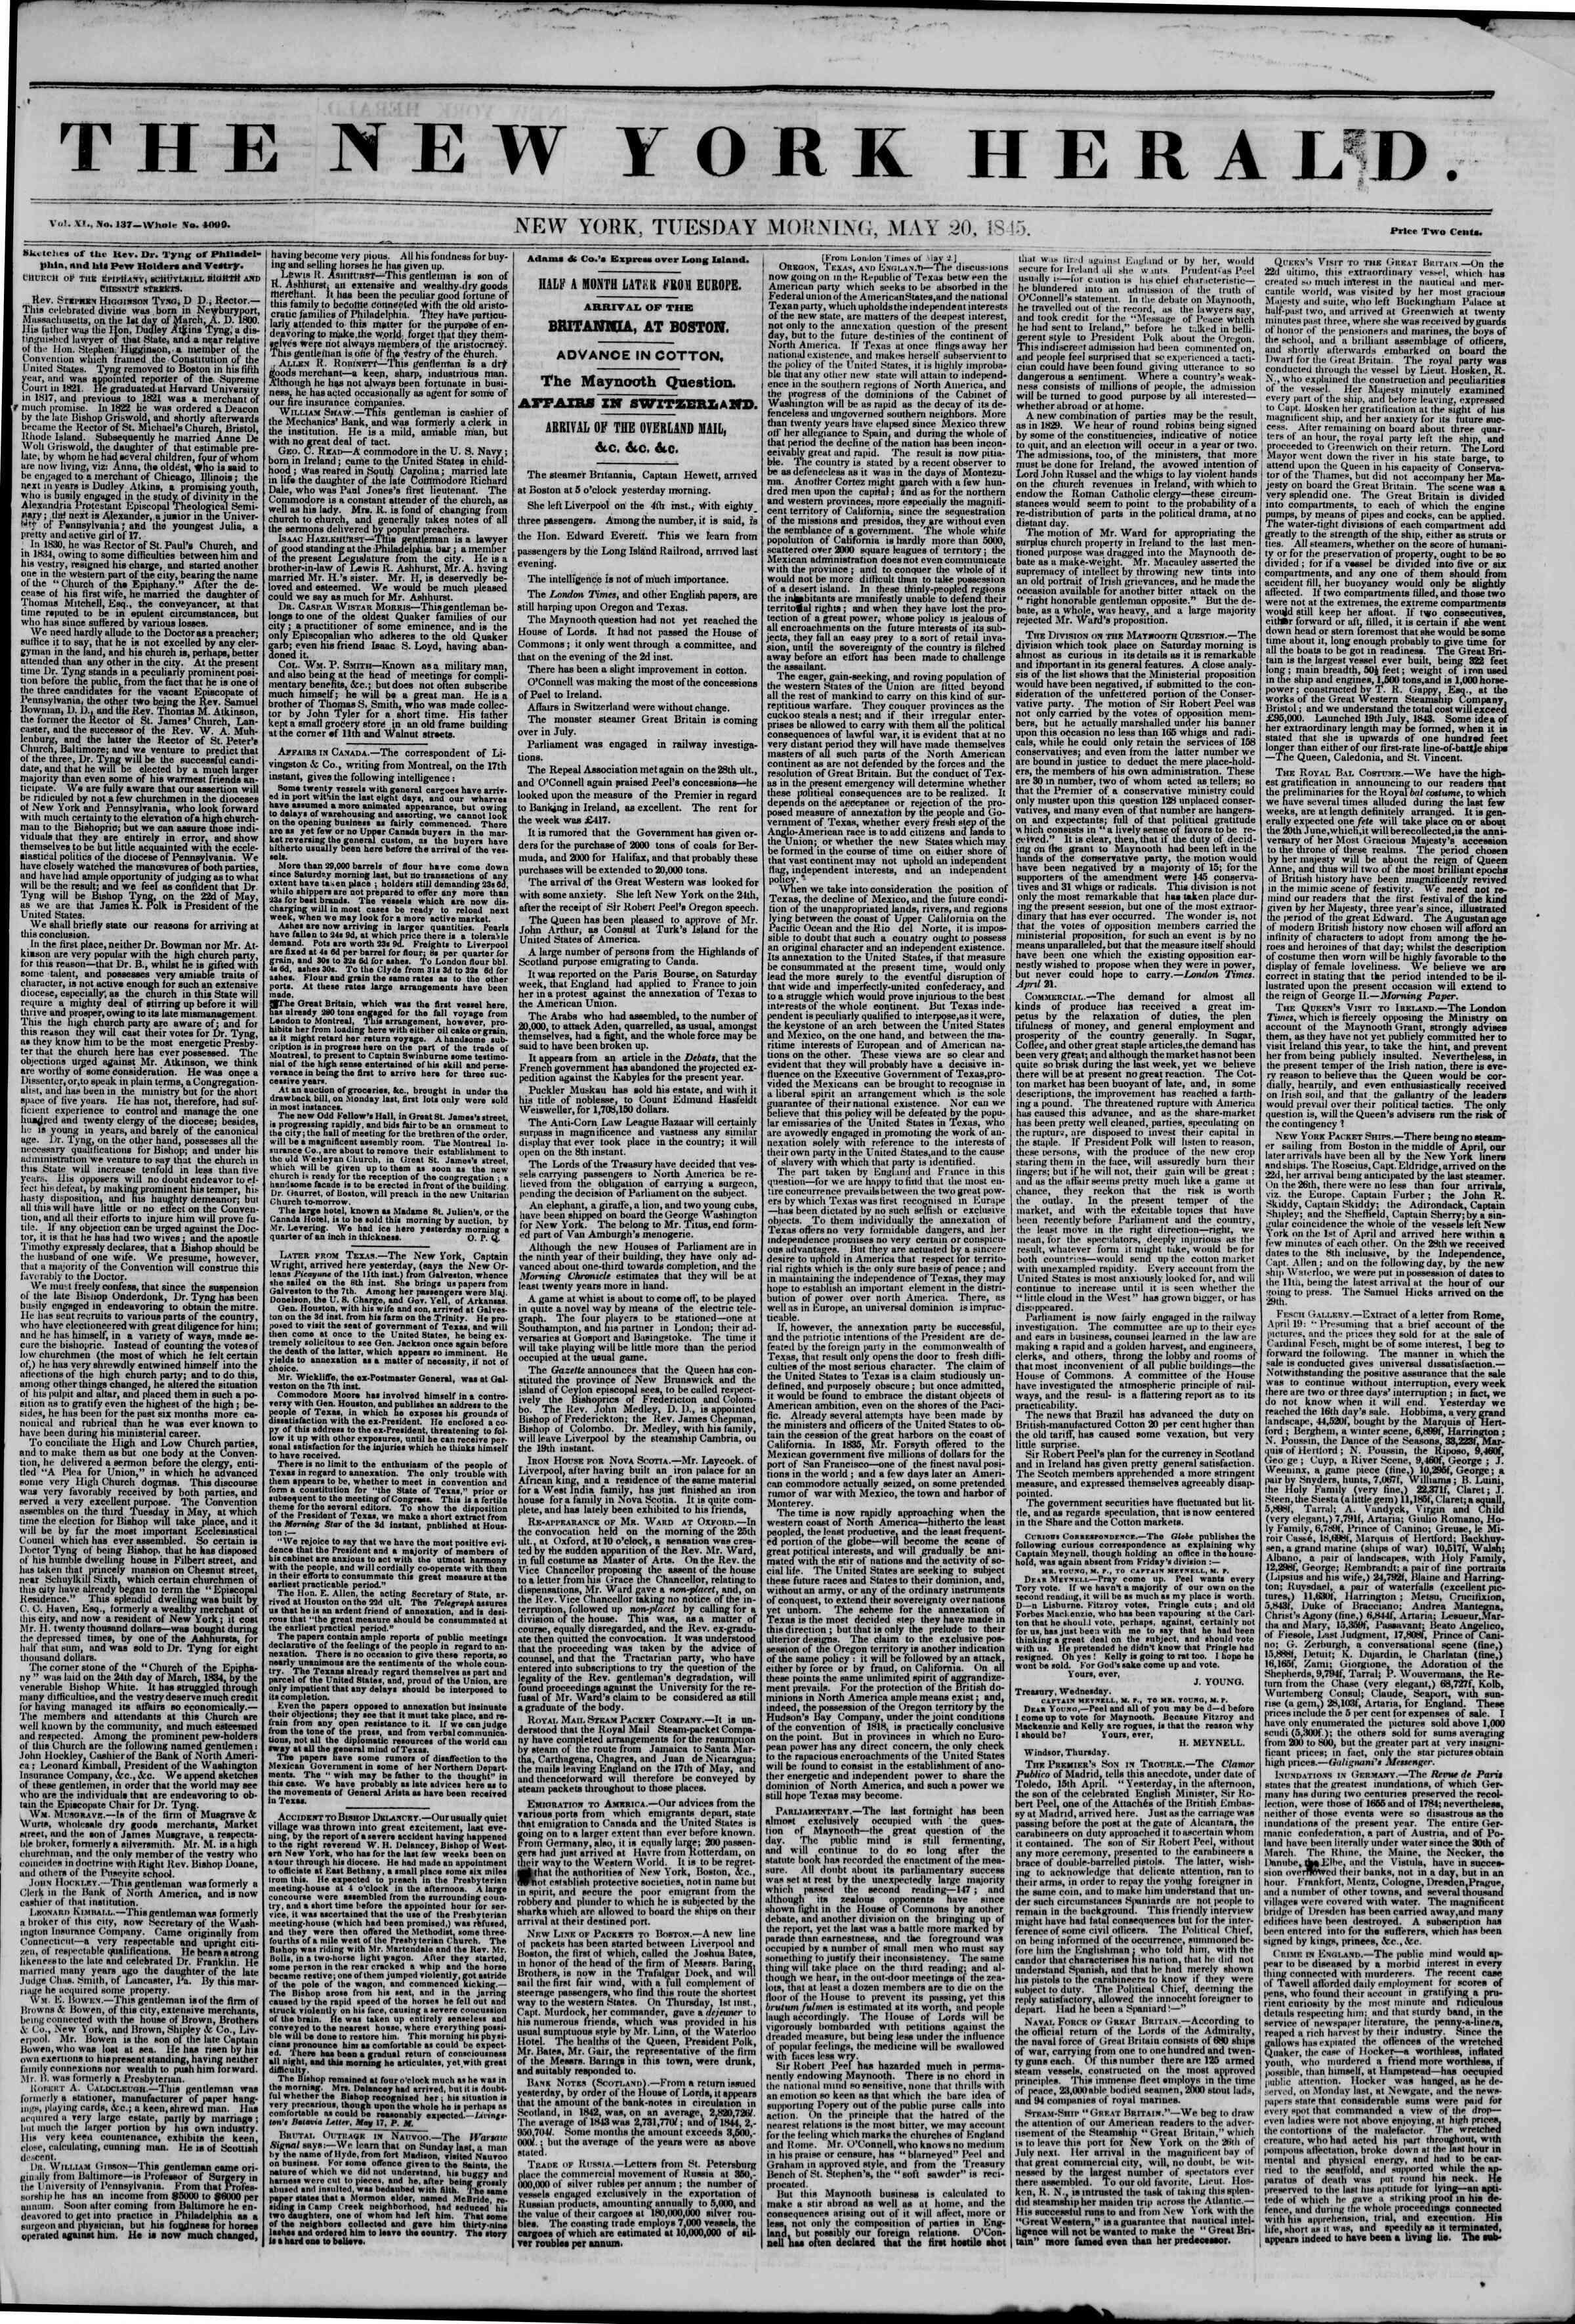 May 20, 1845 Tarihli The New York Herald Gazetesi Sayfa 1